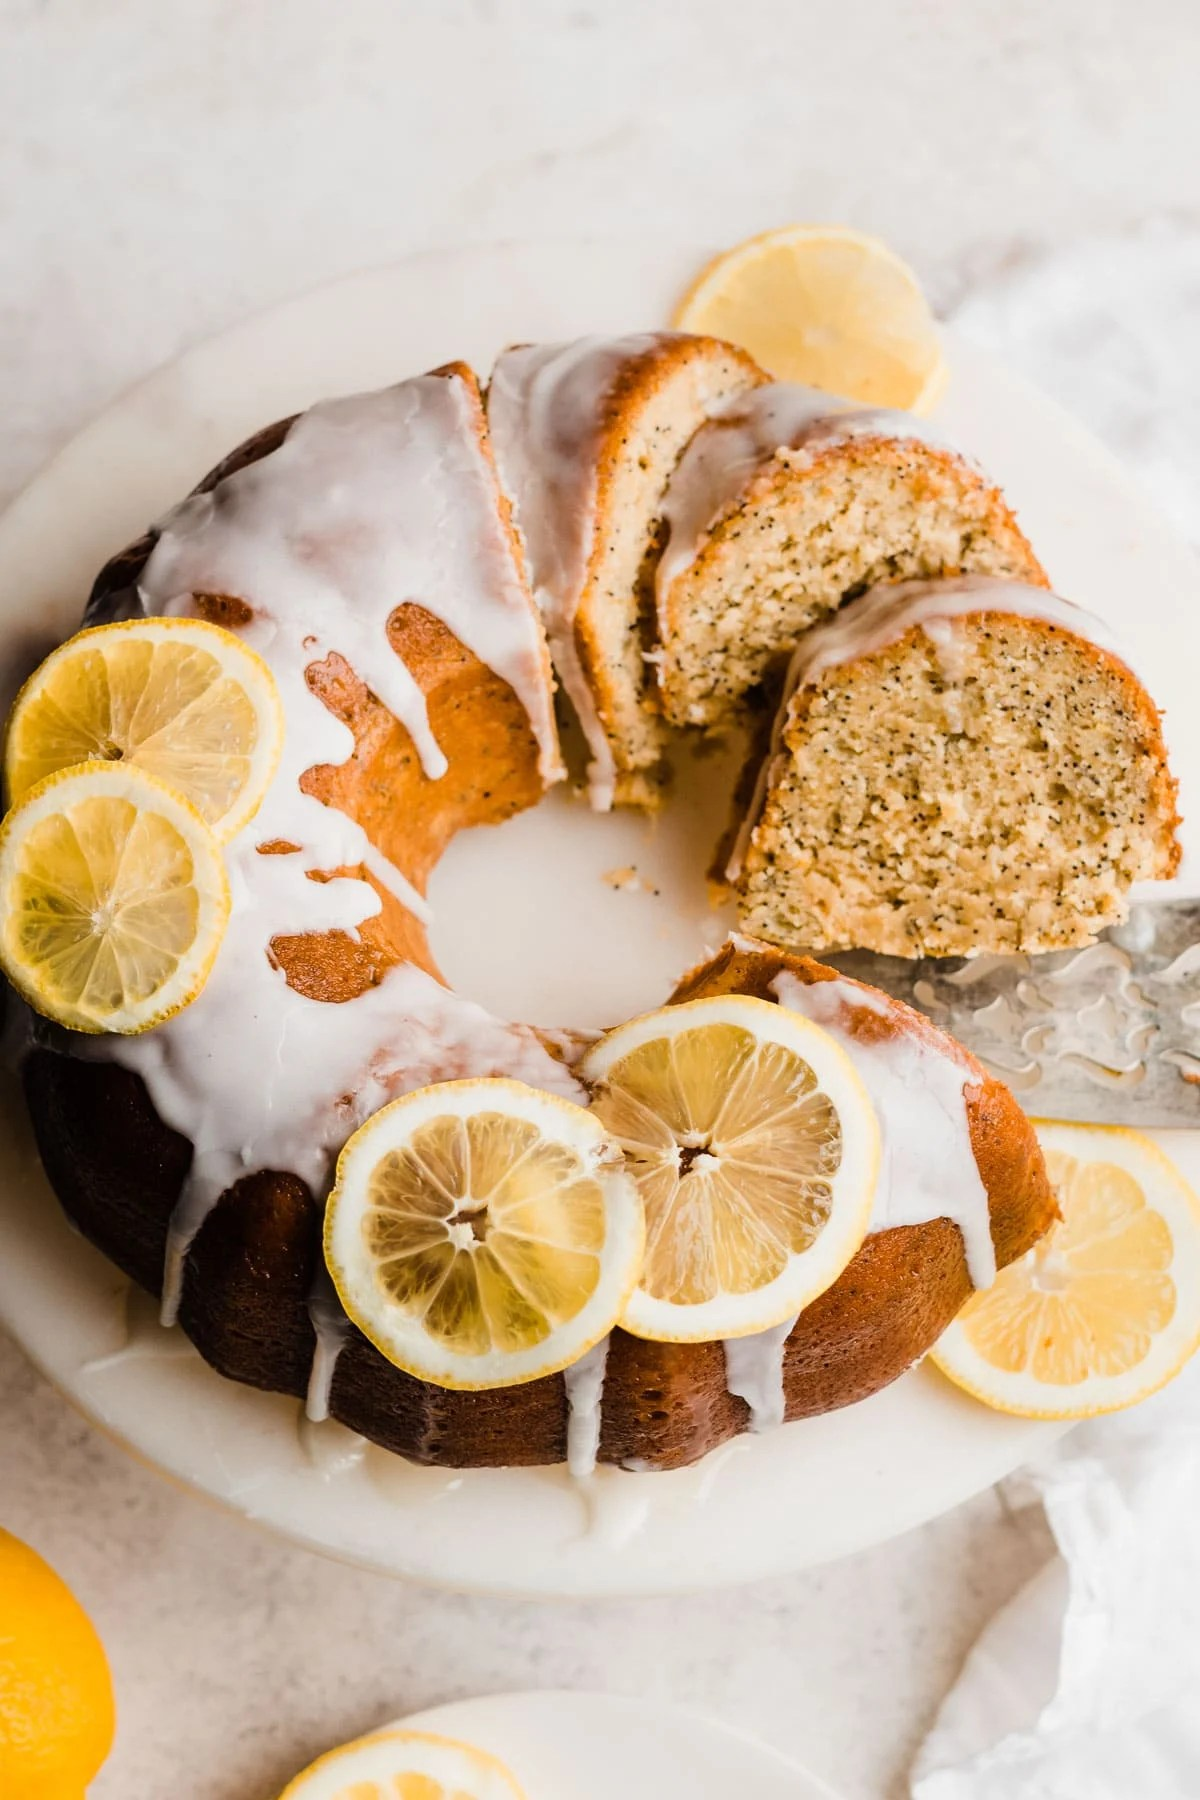 Fluffy Lemon Poppy Seed Cake with Lemon Glaze